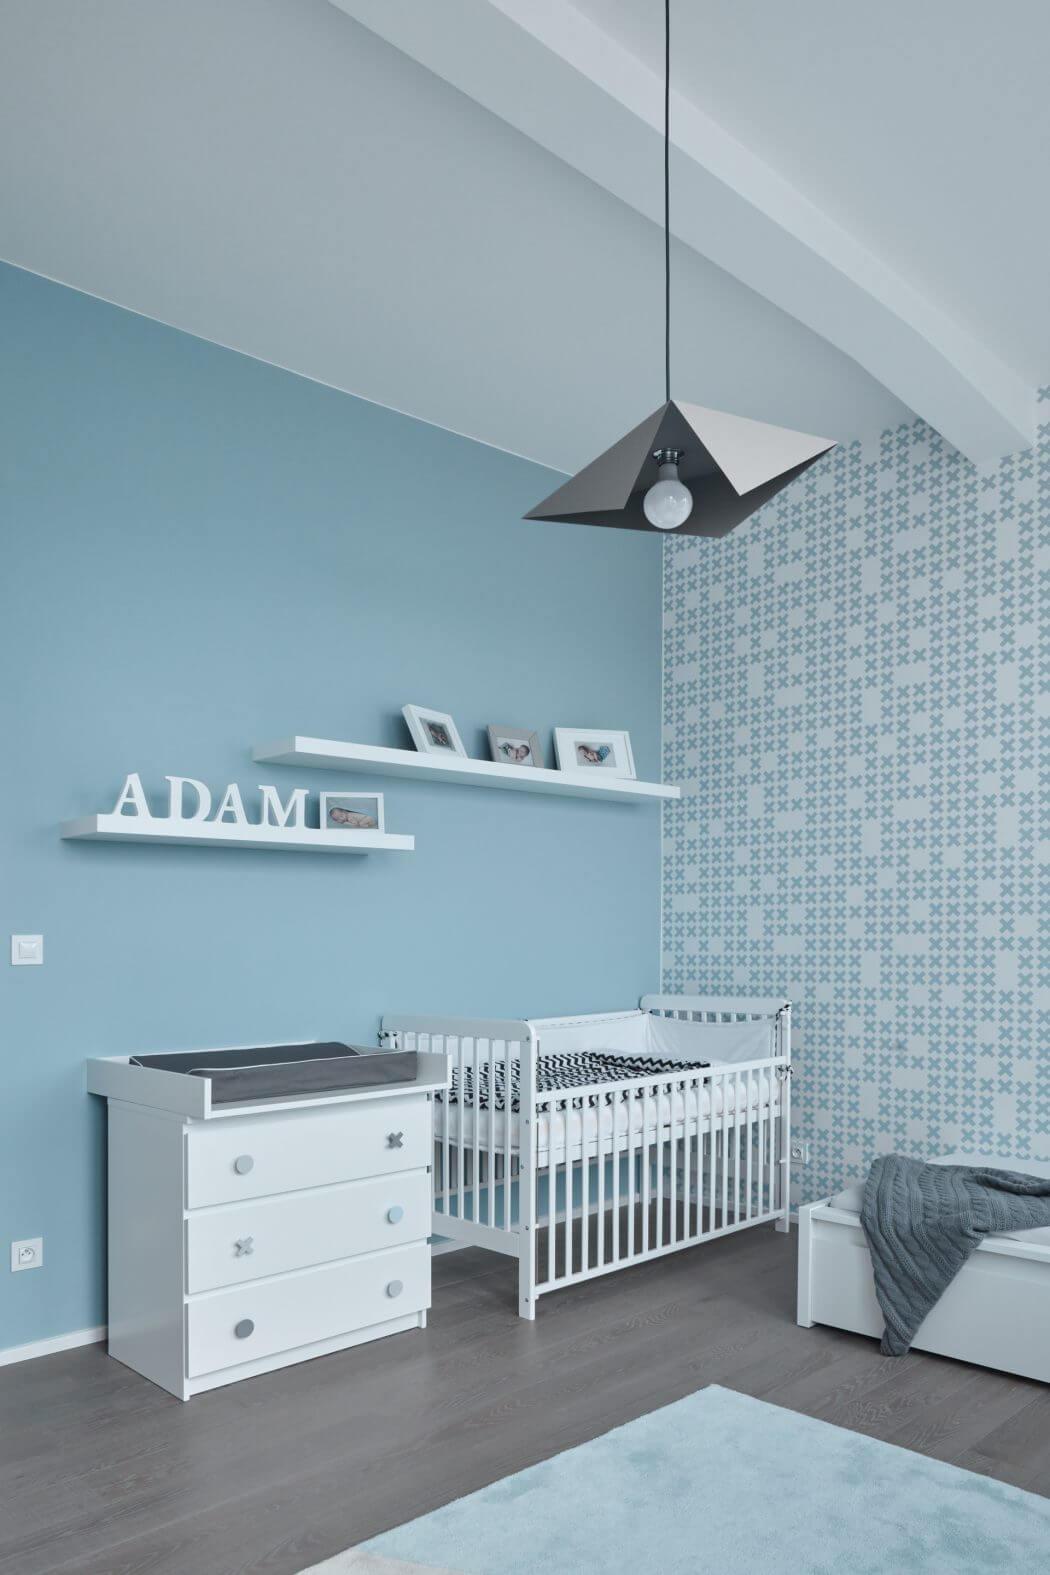 012-loft-f504-smlxl-studio-1050x1575